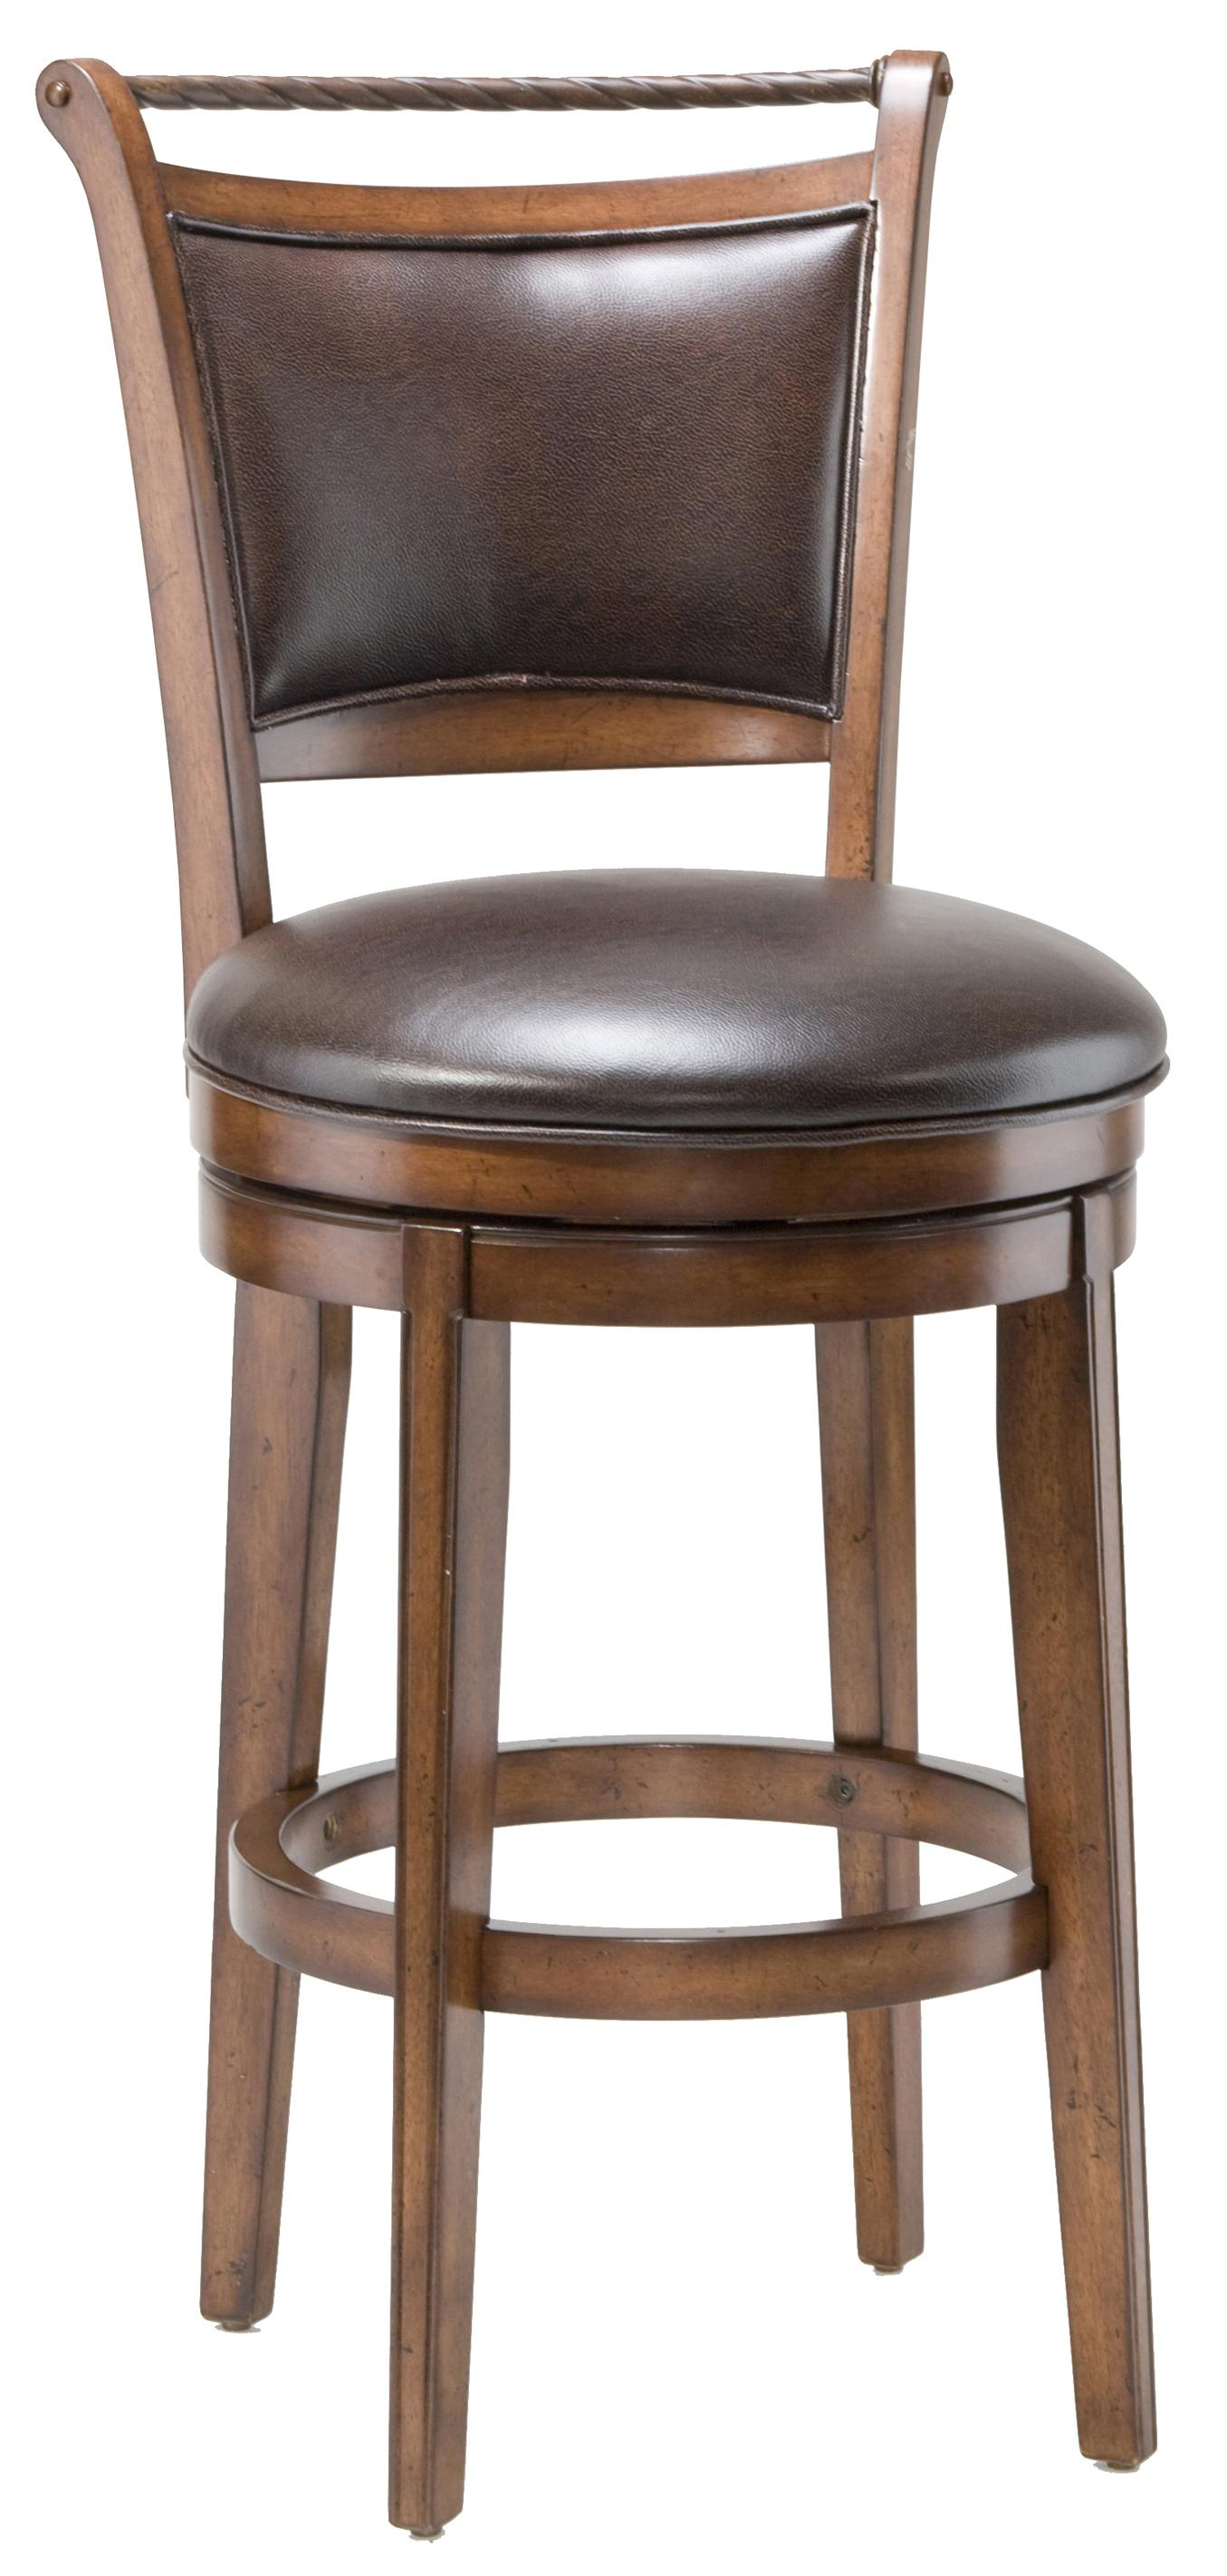 Wood Stools 30 Bar Height Calais Swivel Stool By